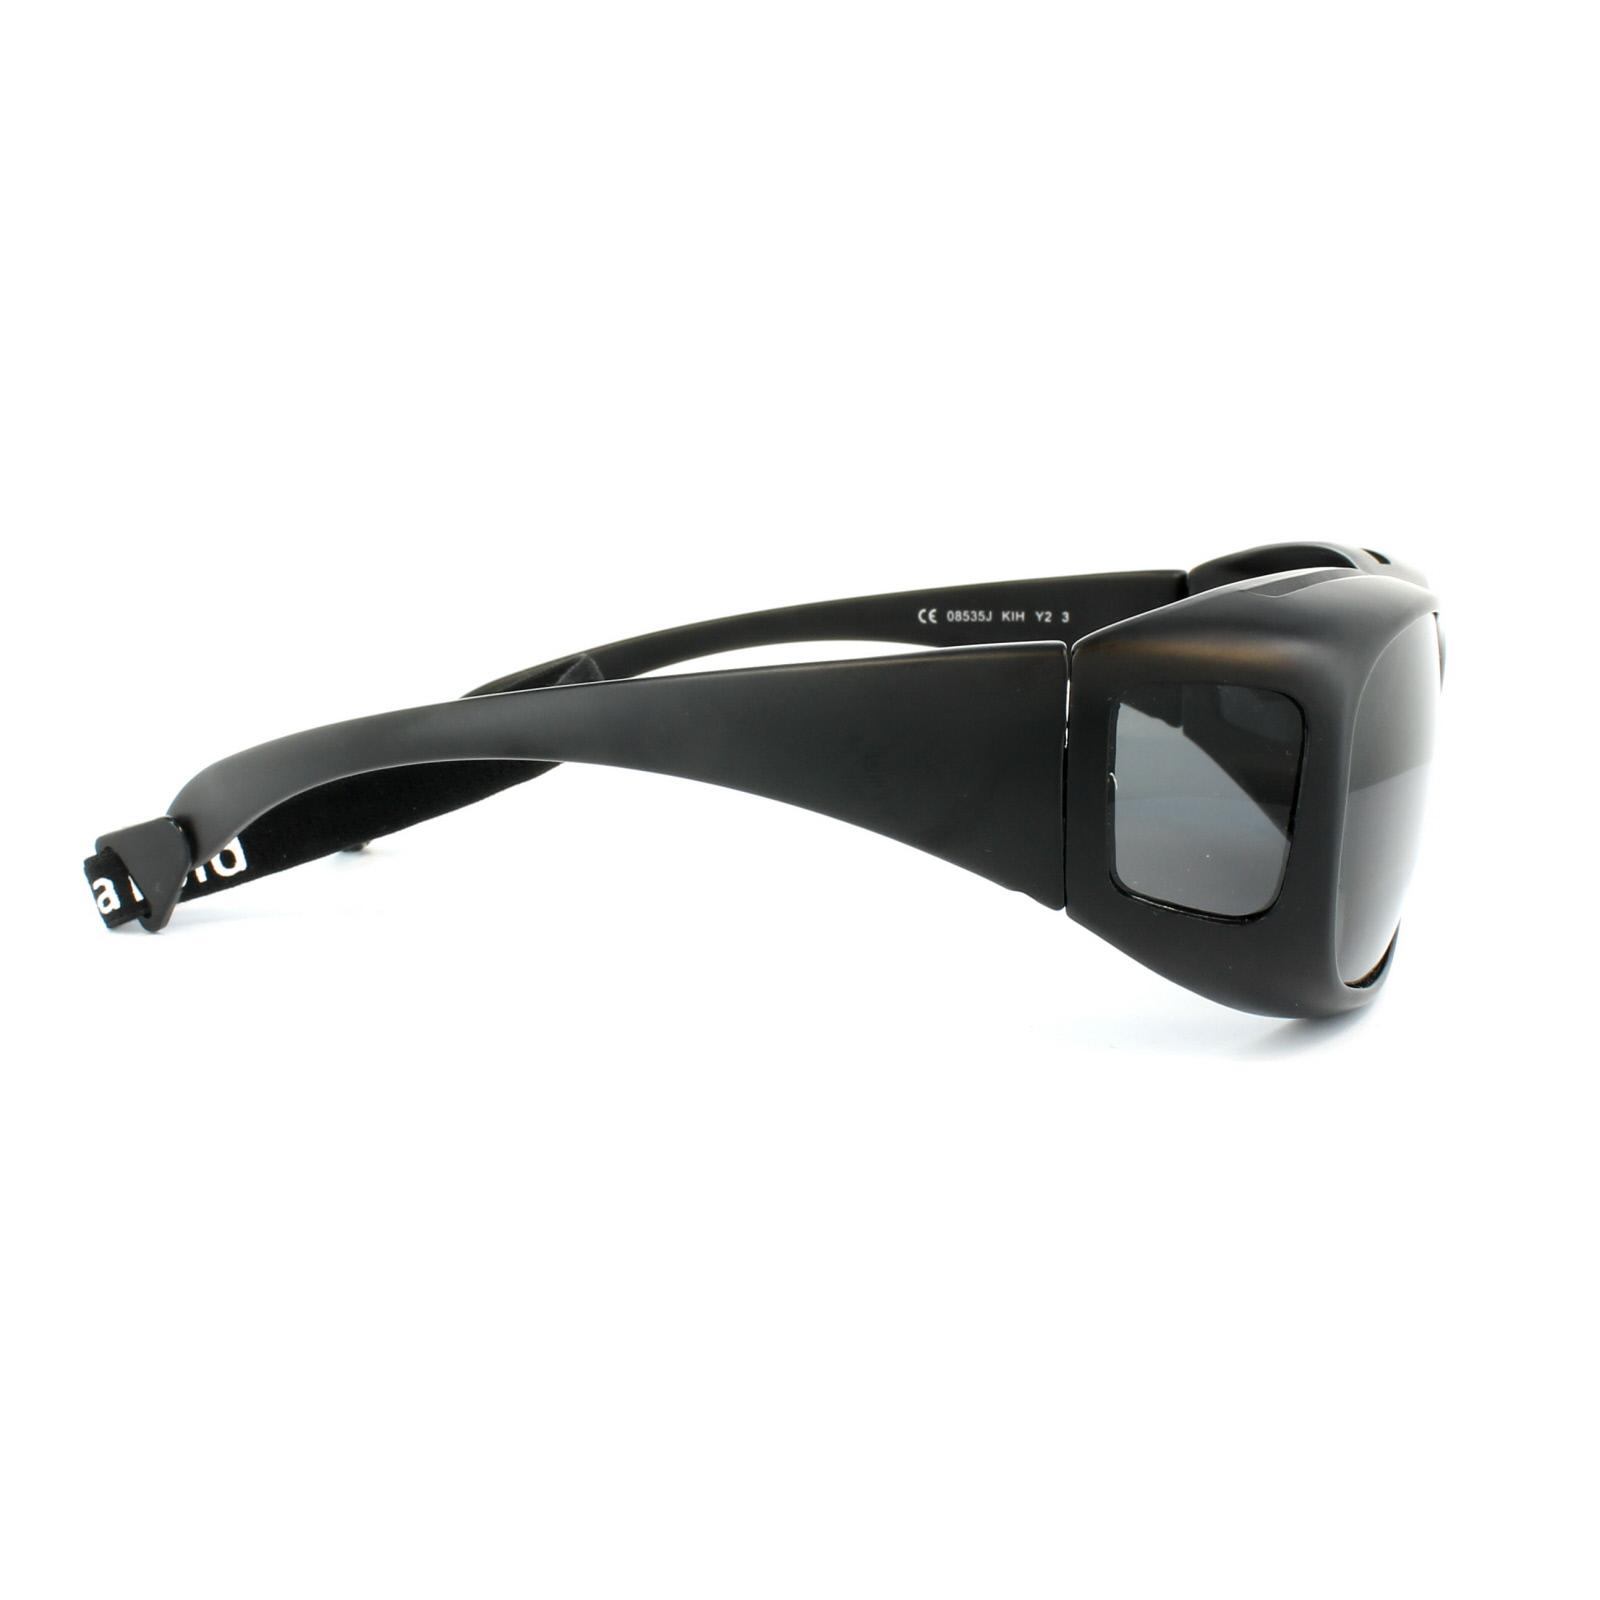 Sentinel Polaroid Suncovers Fitover Sunglasses 08535 KIH Y2 Black Grey  Polarized ddad26b620